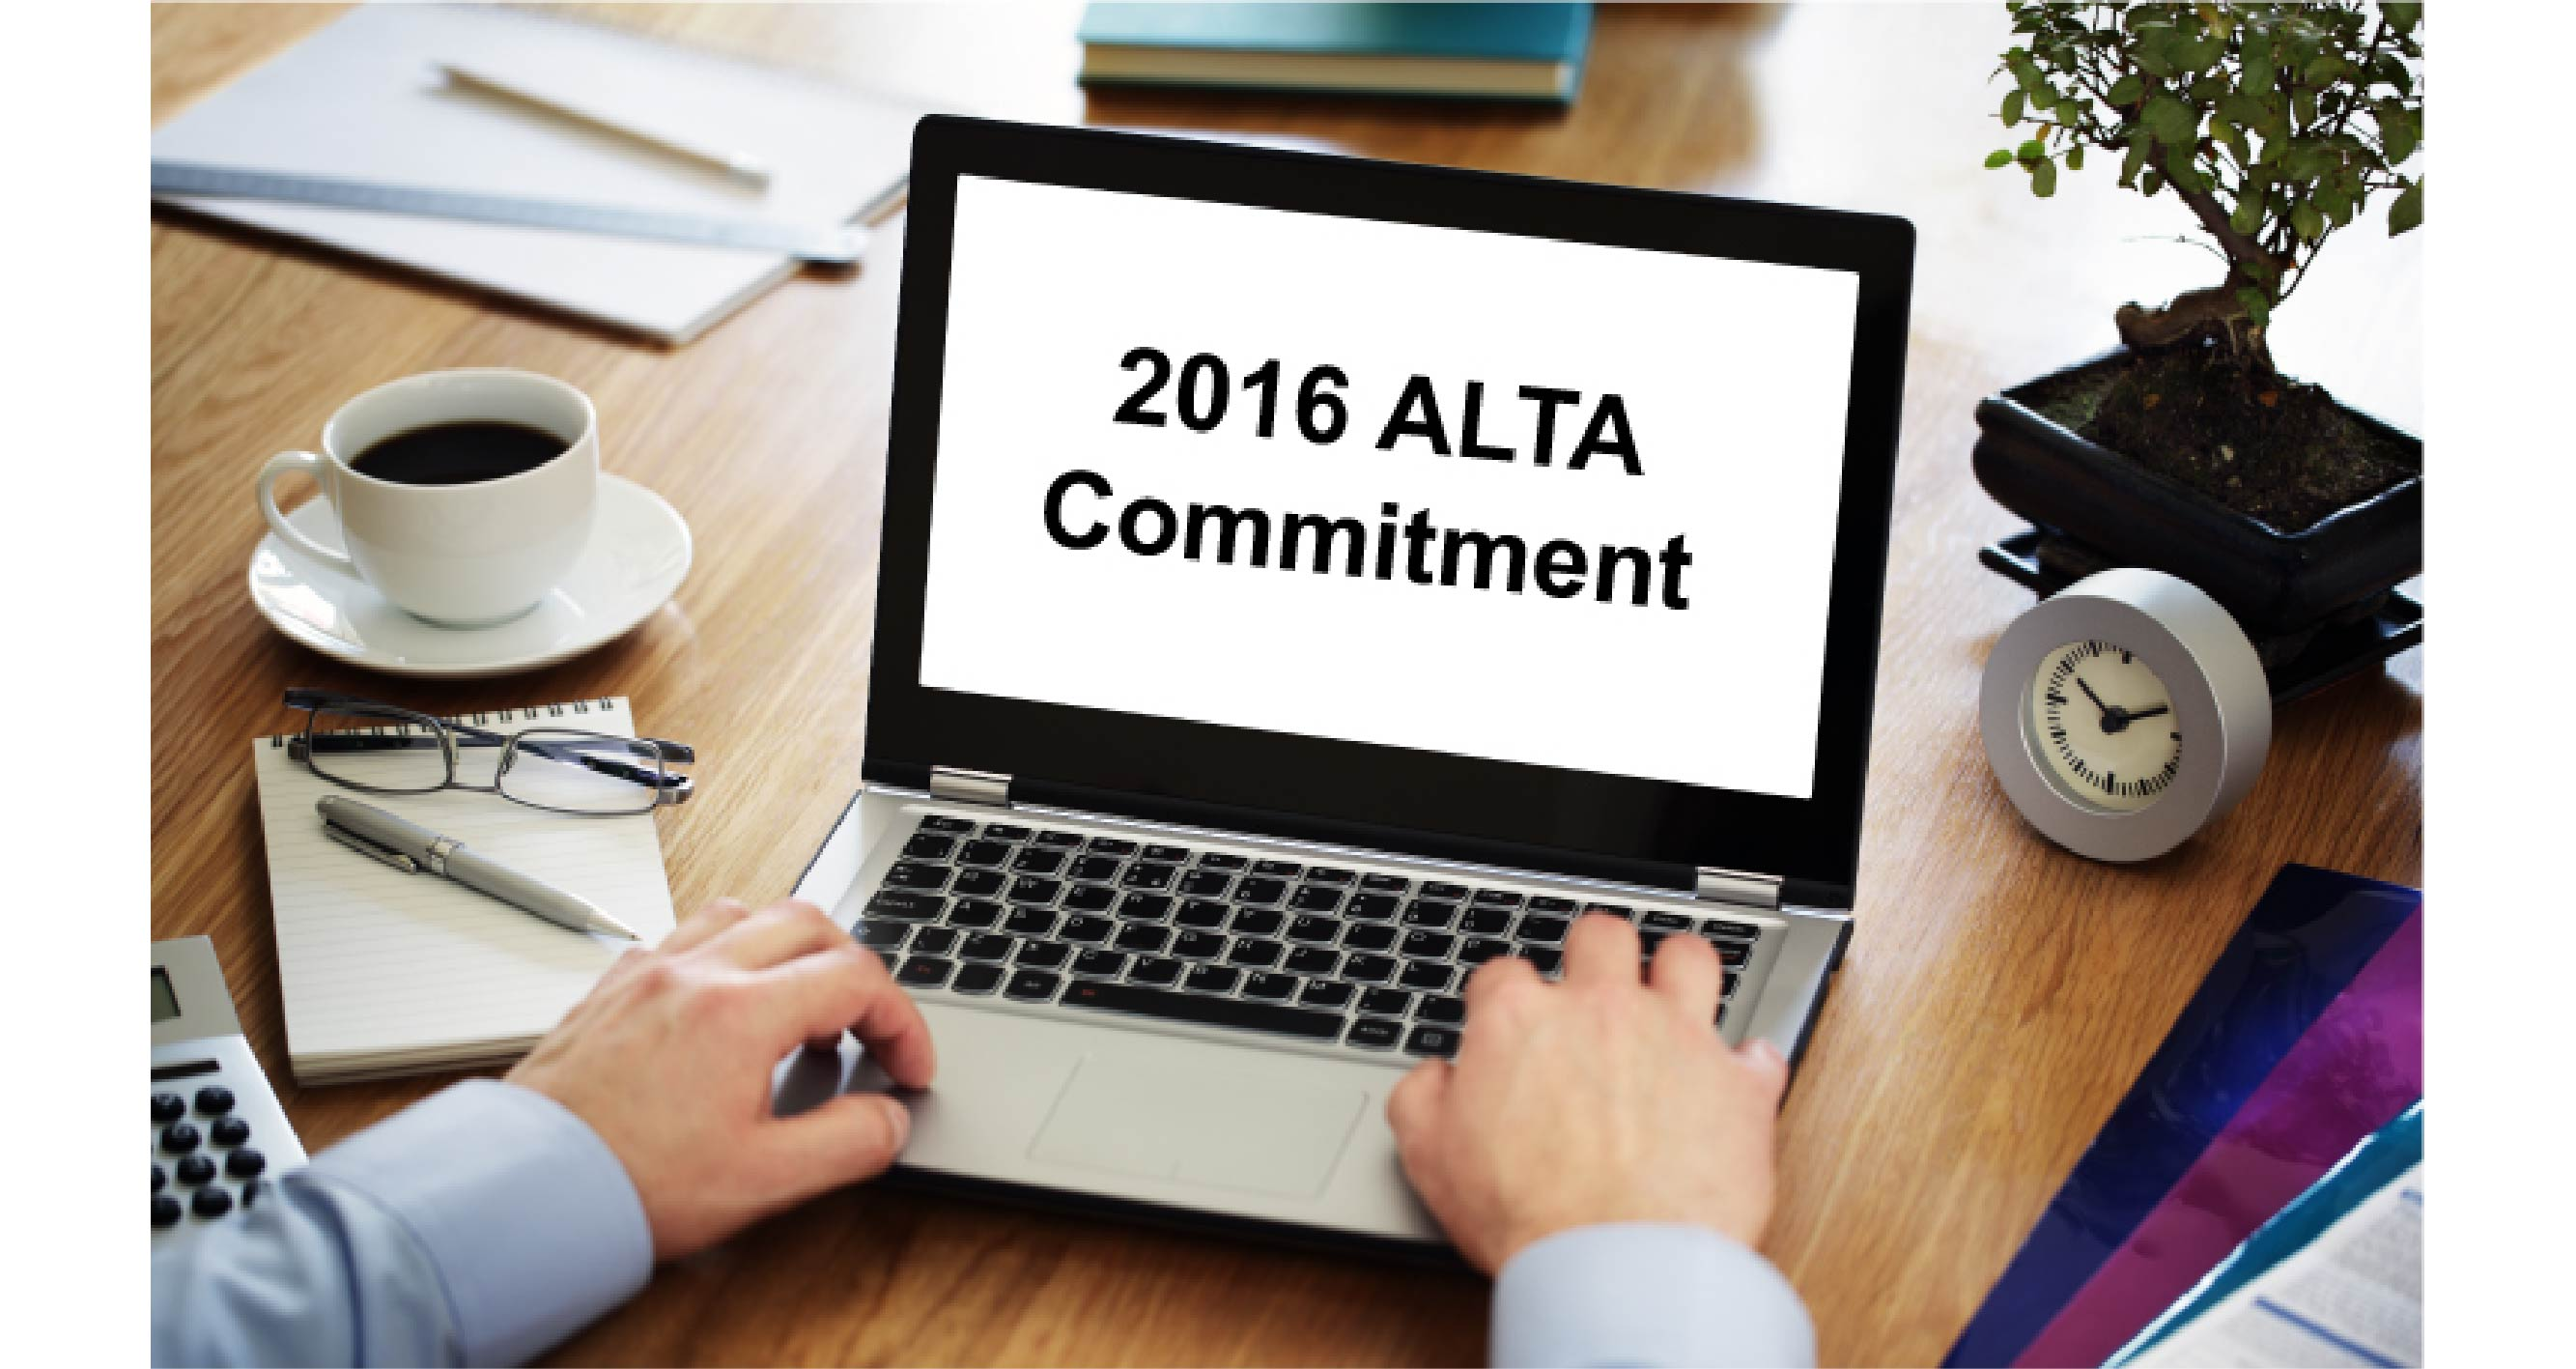 alta 2016 commitment-final-01